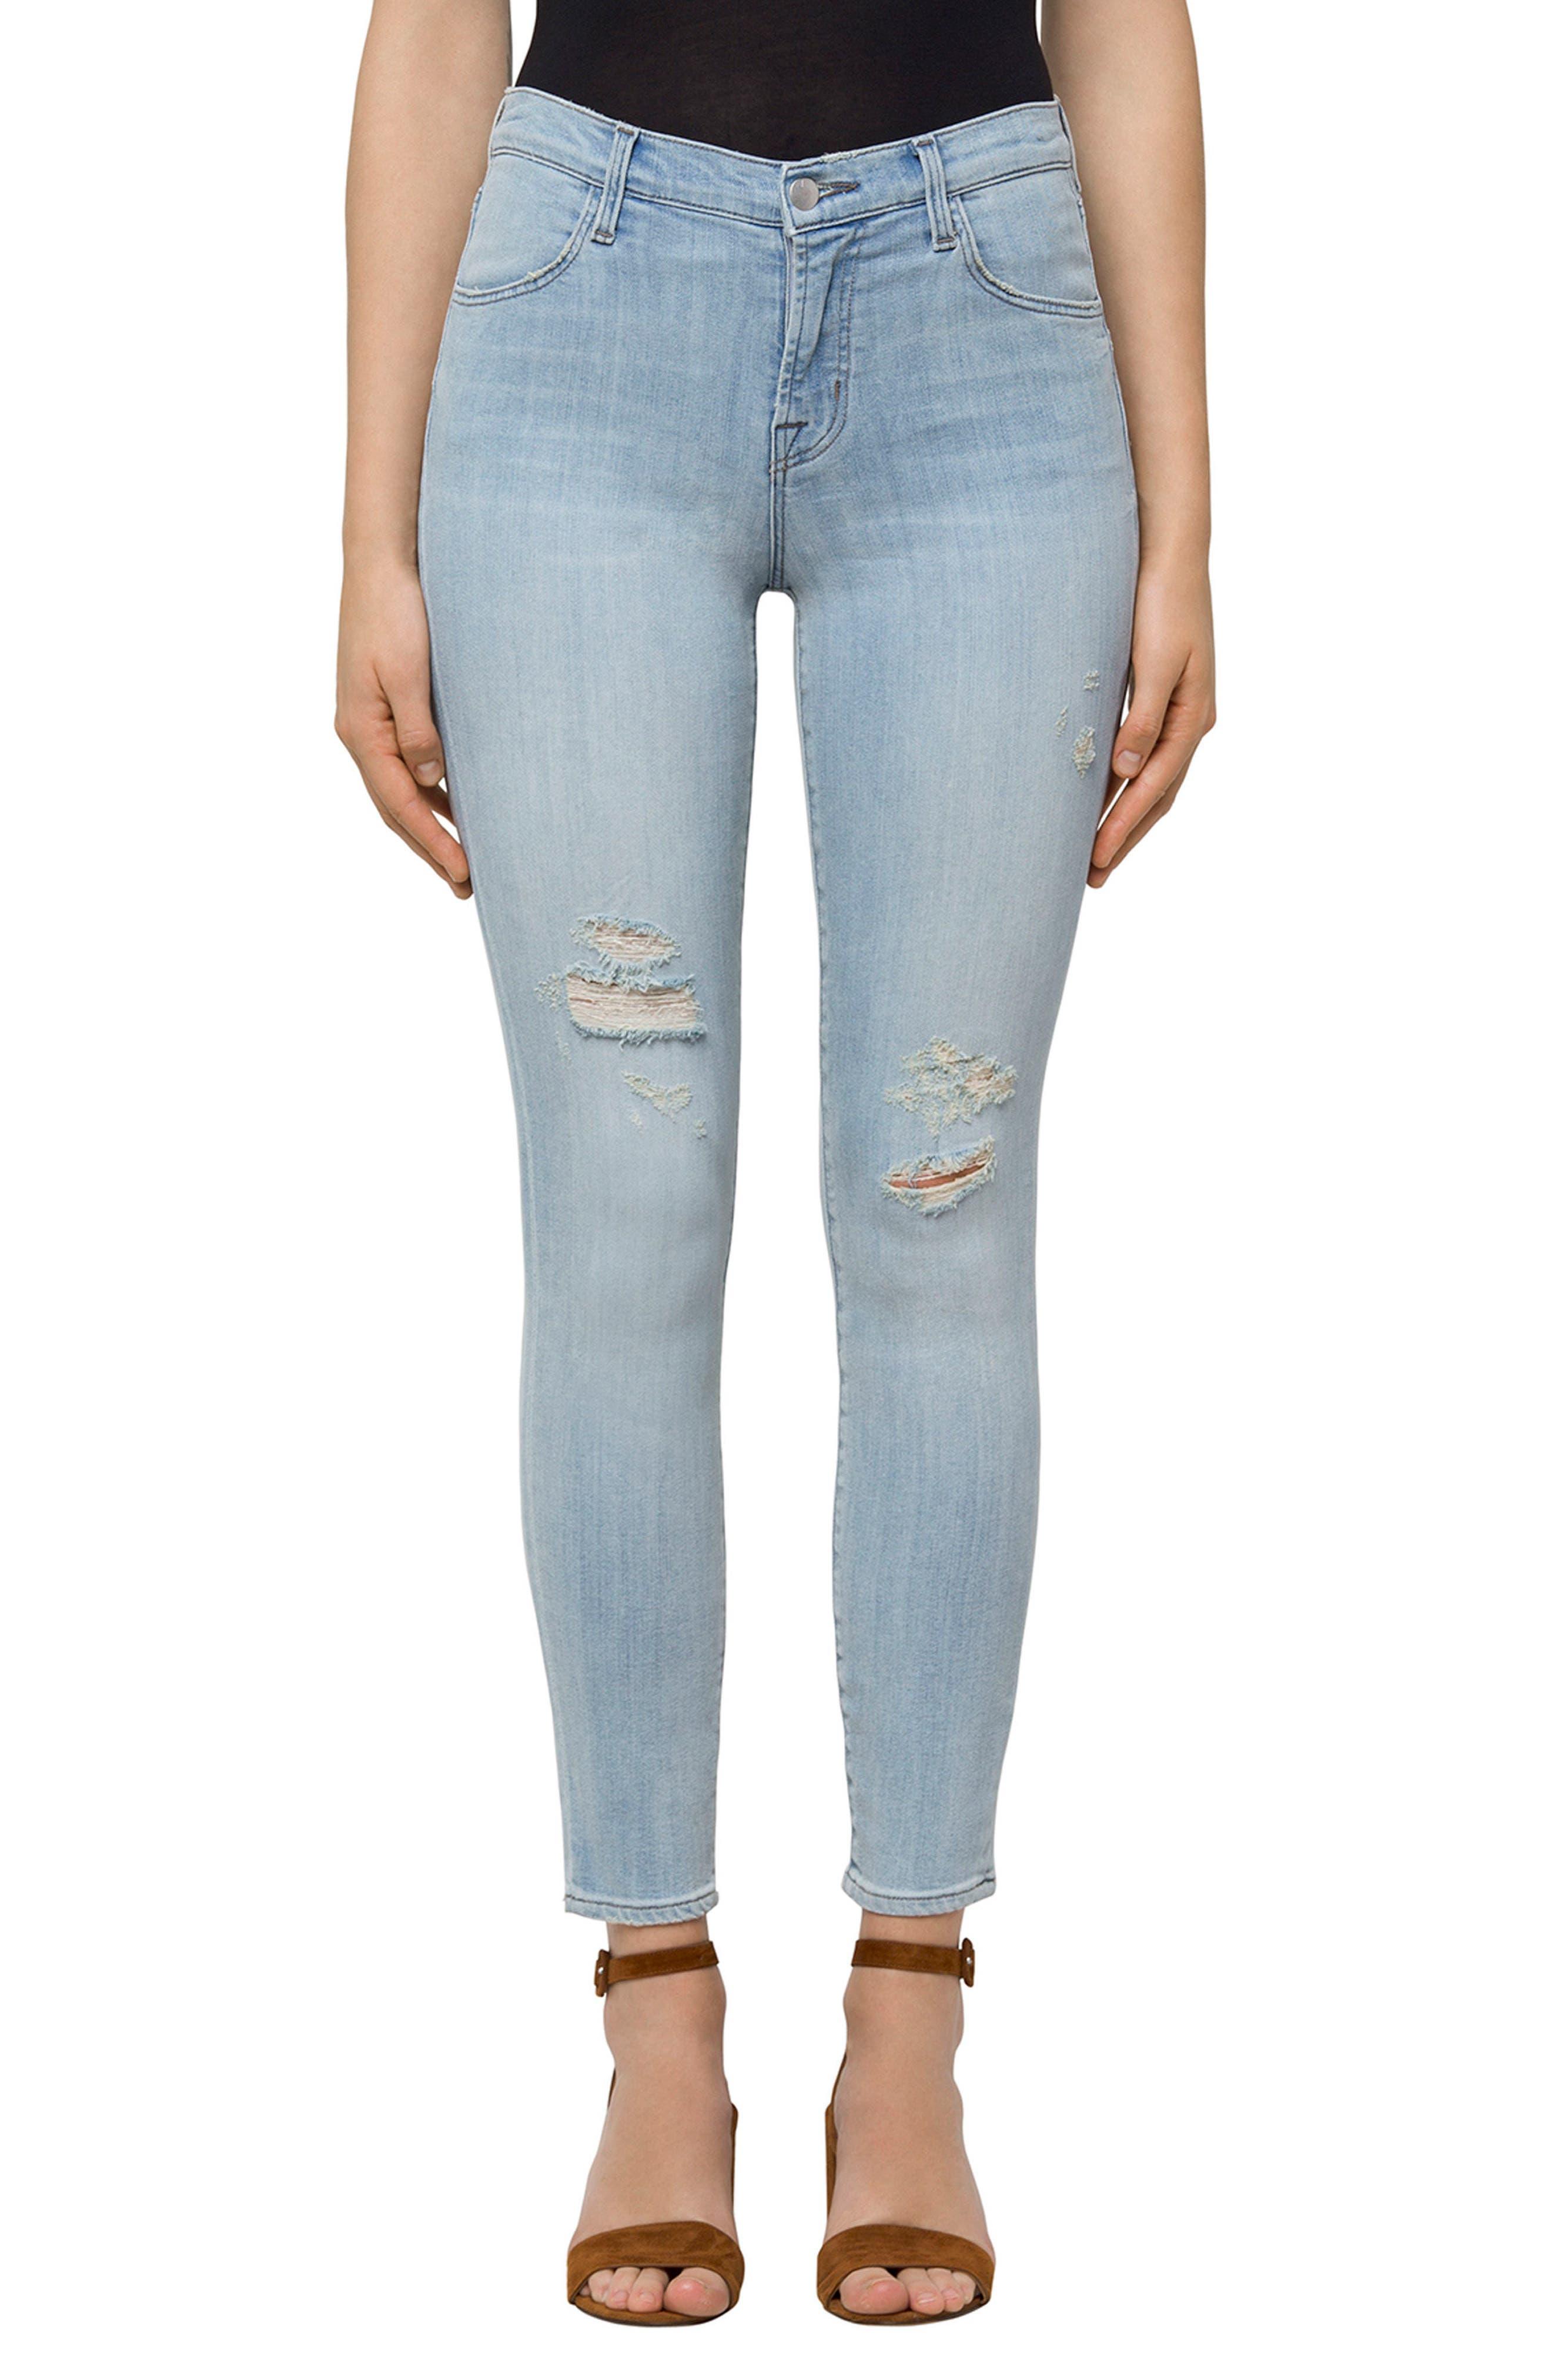 Main Image - J Brand Alana High Waist Ankle Skinny Jeans (Refresh Destruct)